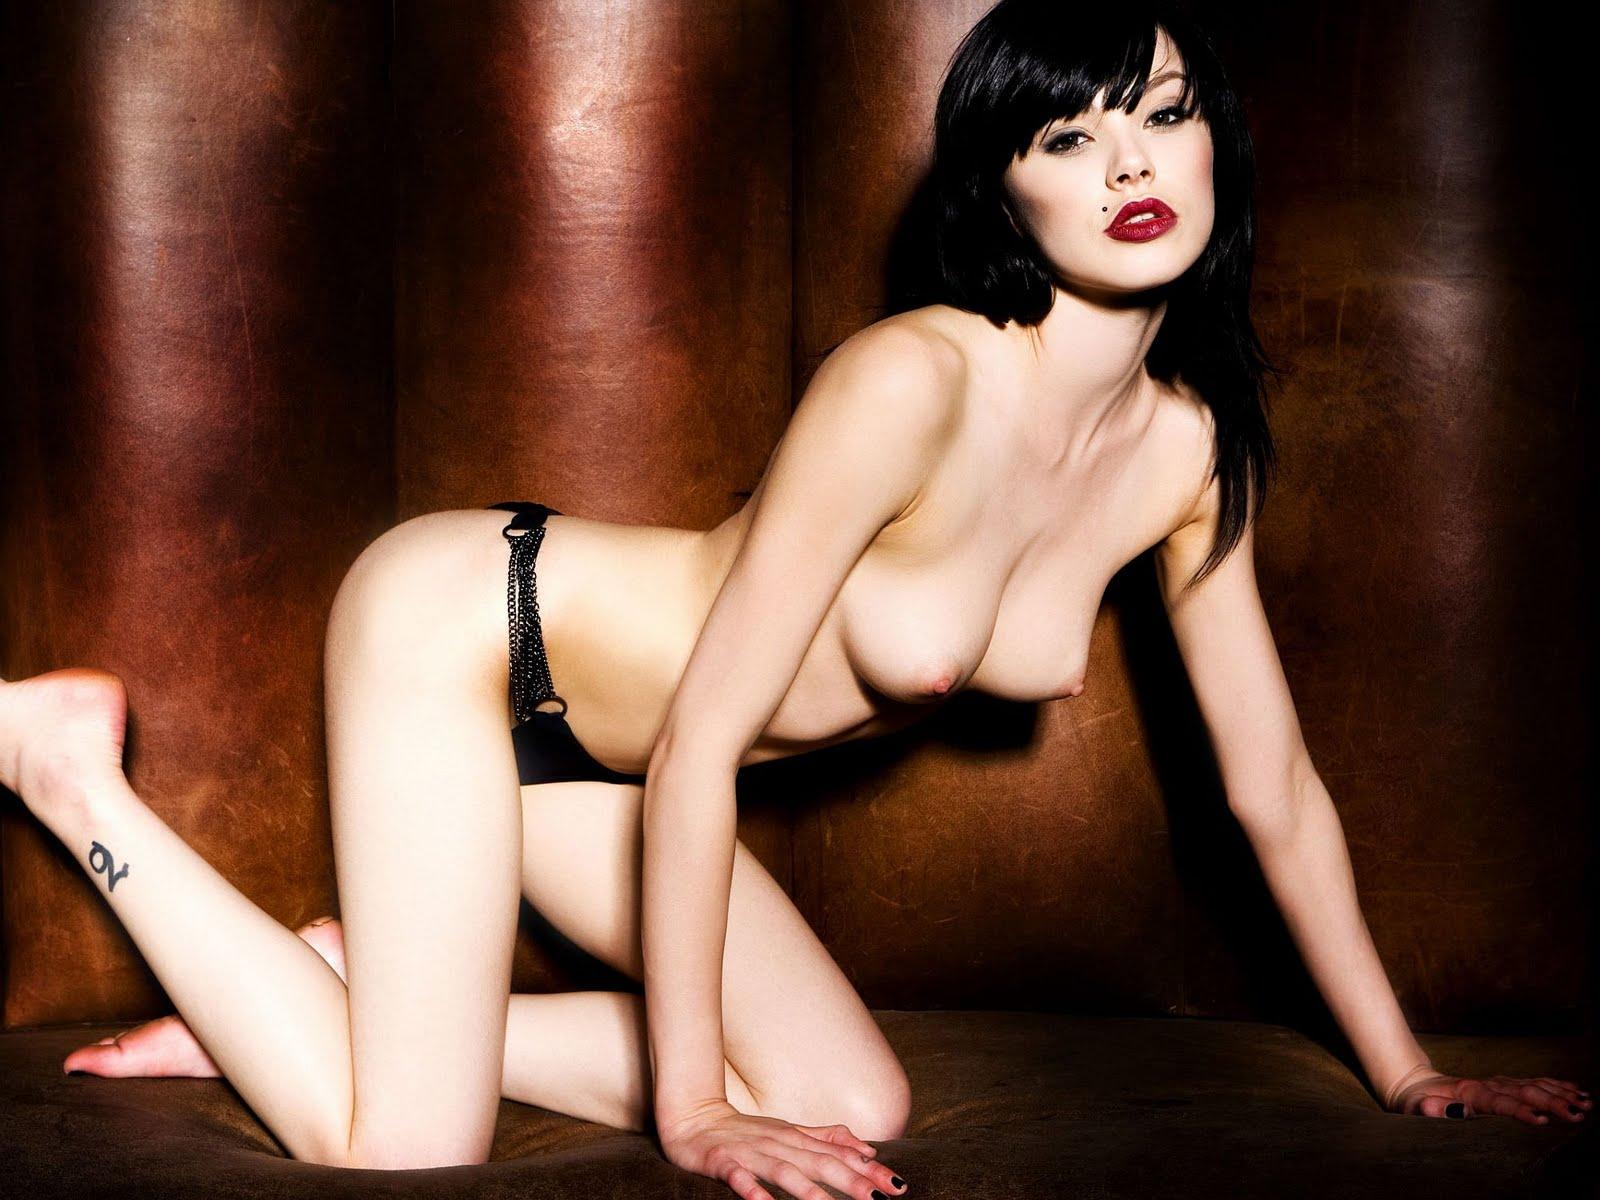 http://2.bp.blogspot.com/-K6uganO494c/TX3mj9cLAaI/AAAAAAAAHF8/ZqFkMv_3_yQ/s1600/celebskin_vikki_blows_topless_panties_cowboyboots_wallpaper_2.jpg